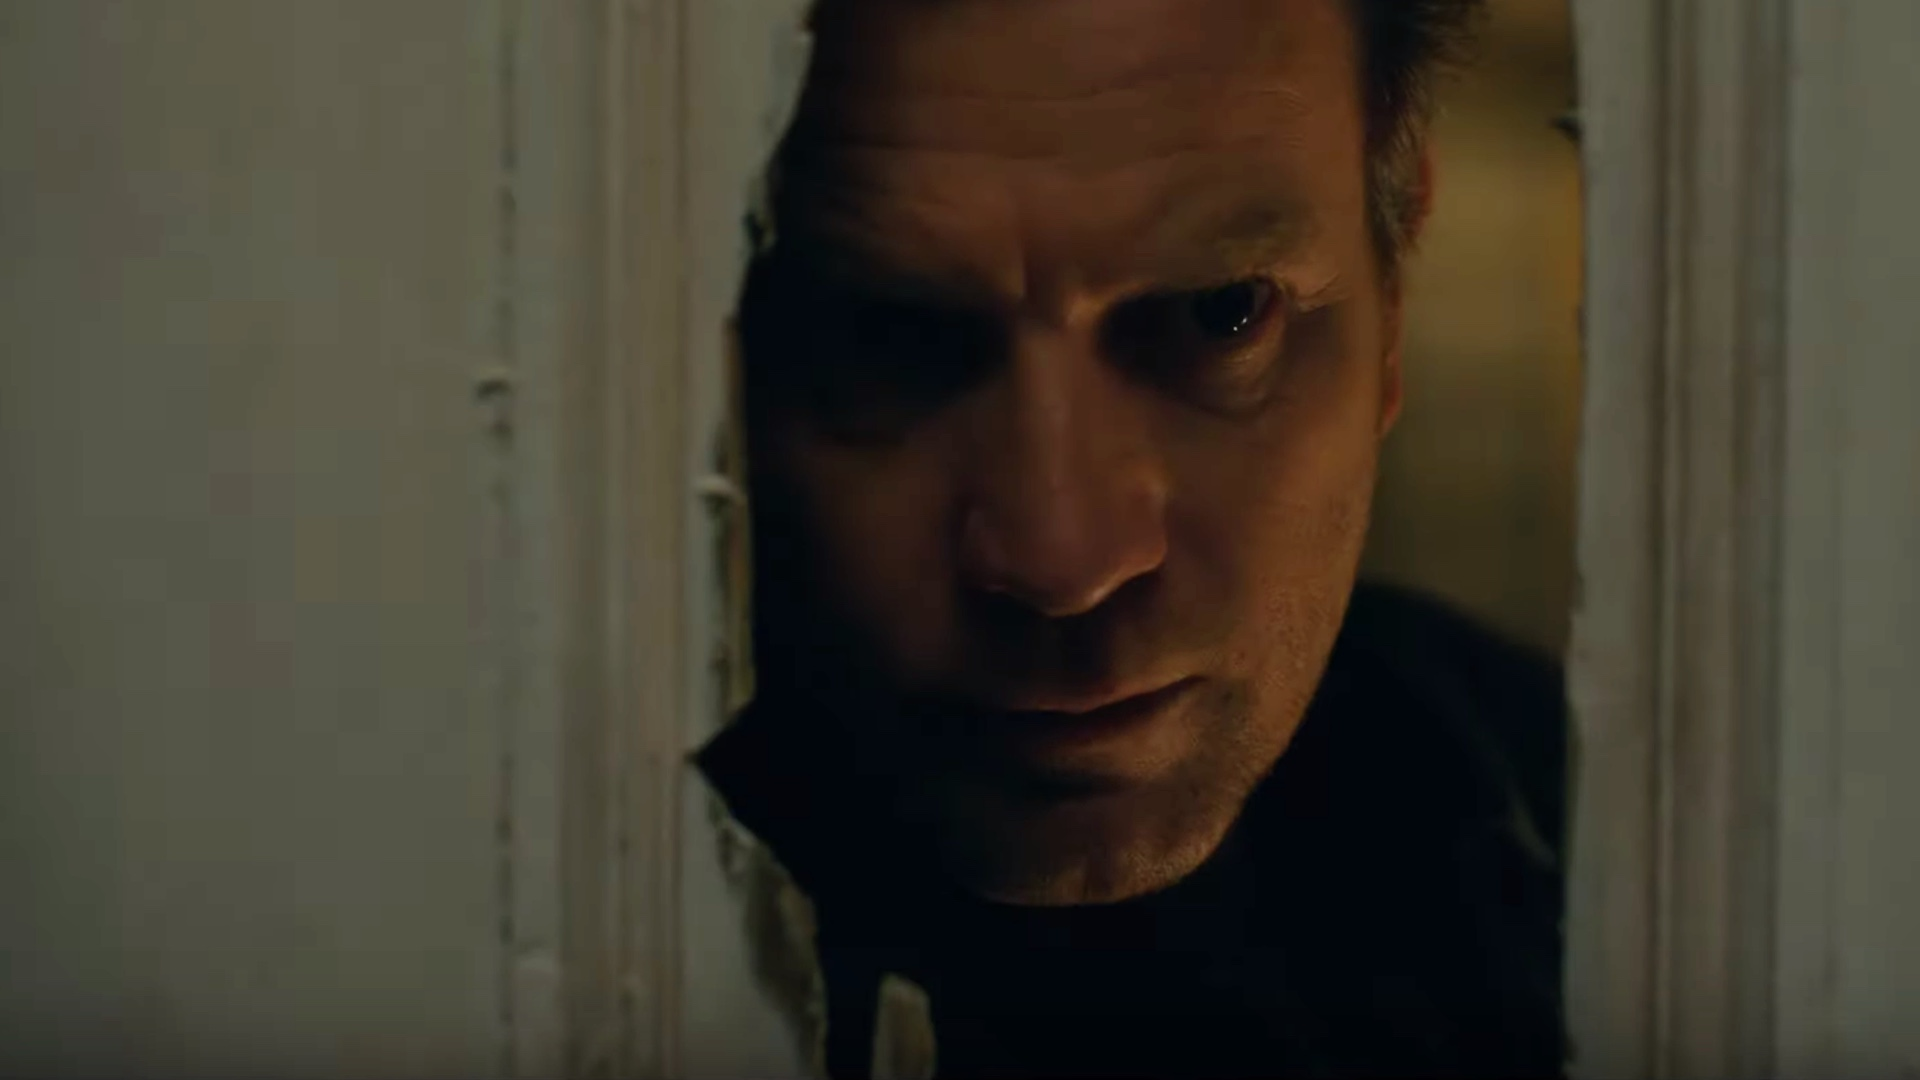 Dr. Sleep: Erster Trailer zur Verfilmung zu Stephen King's 'The Shining' Fortsetzung